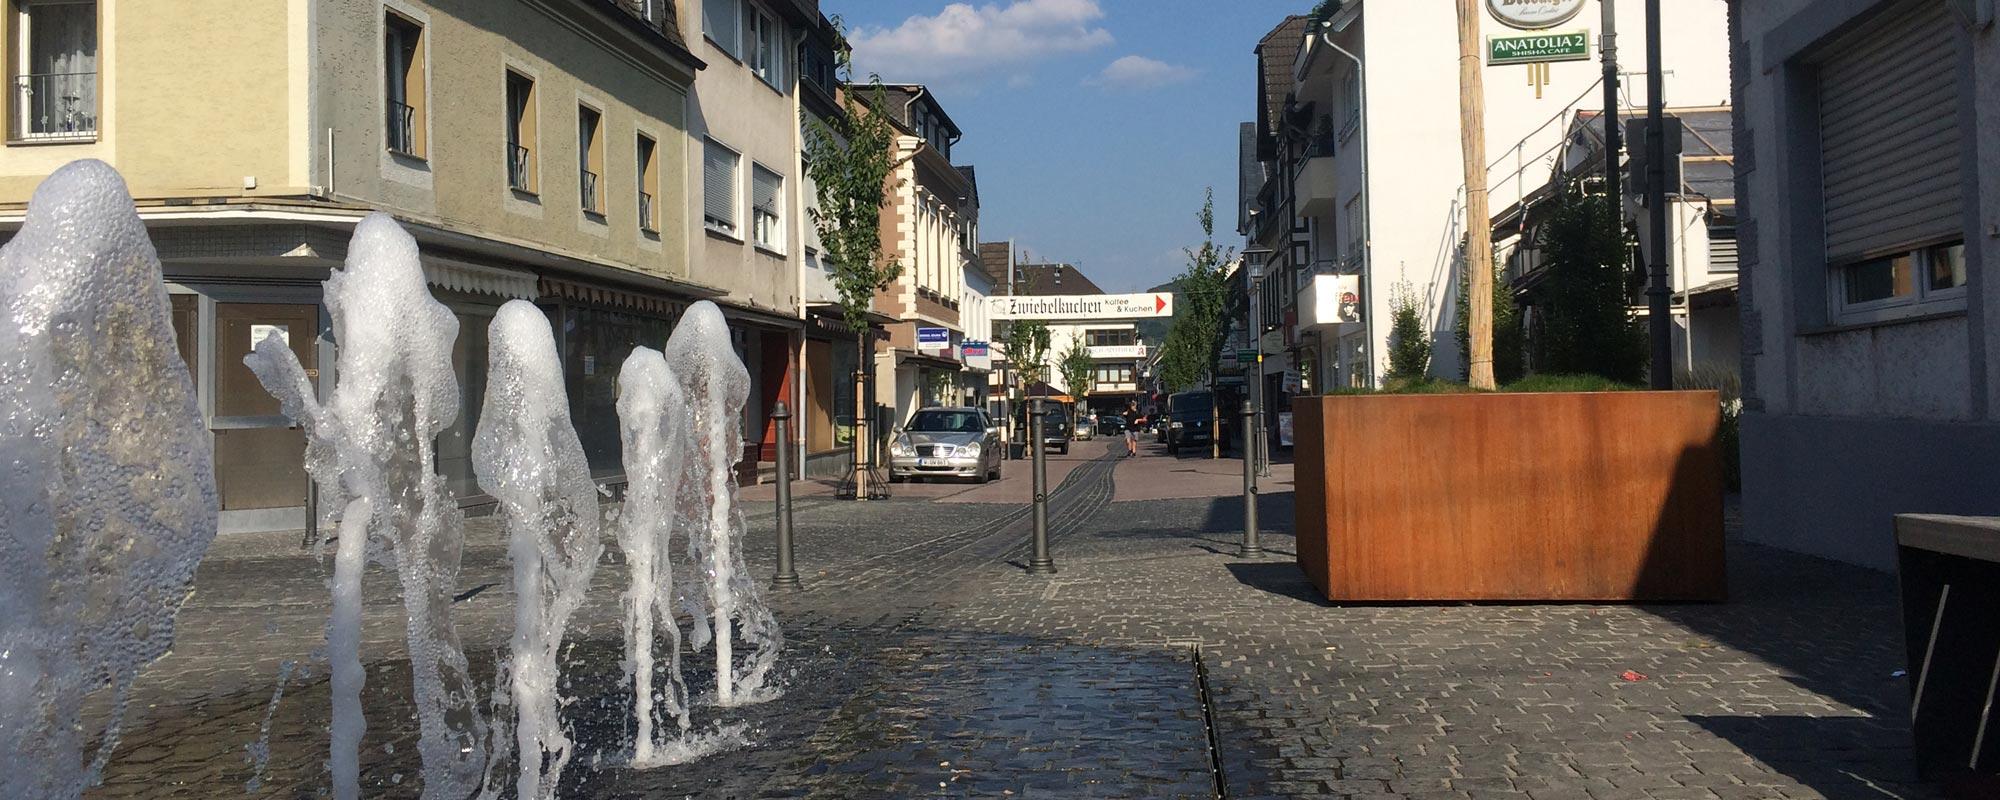 Straßenplanung_Bachstraße_Slide_1